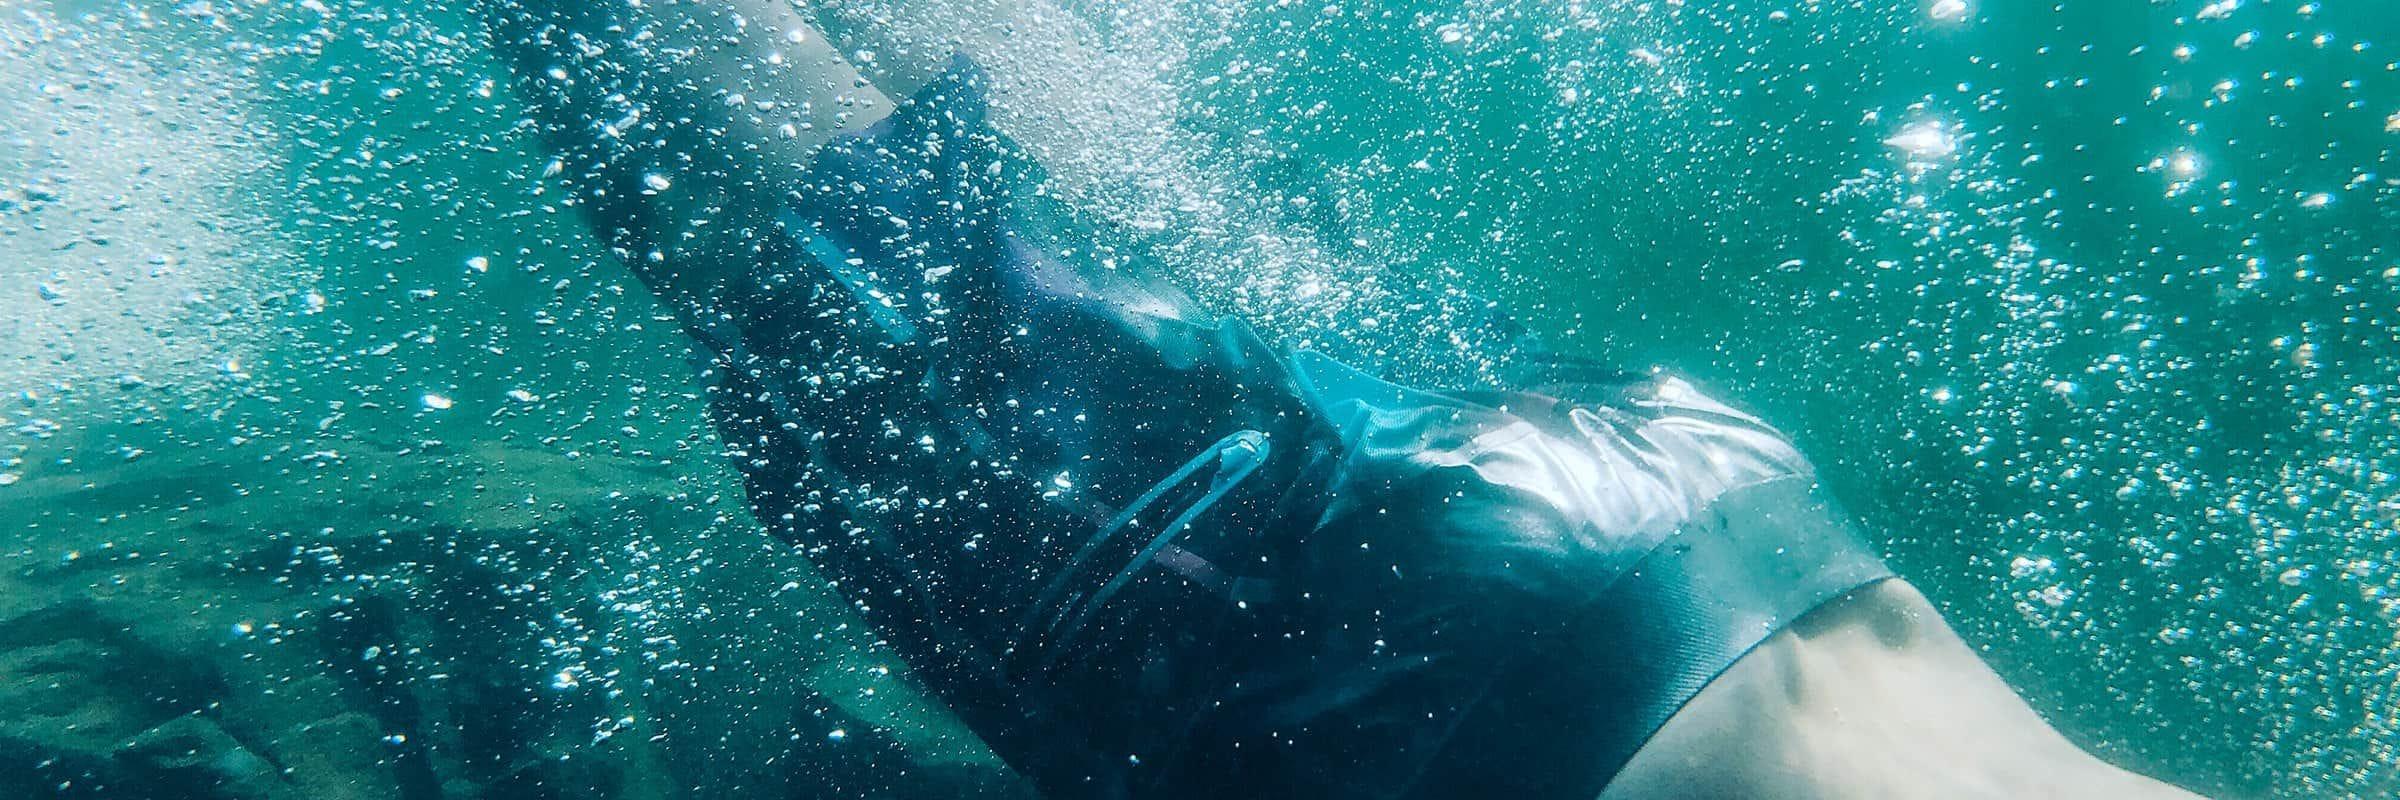 O'Neill Hyperfreak Hydro Boardshorts Review